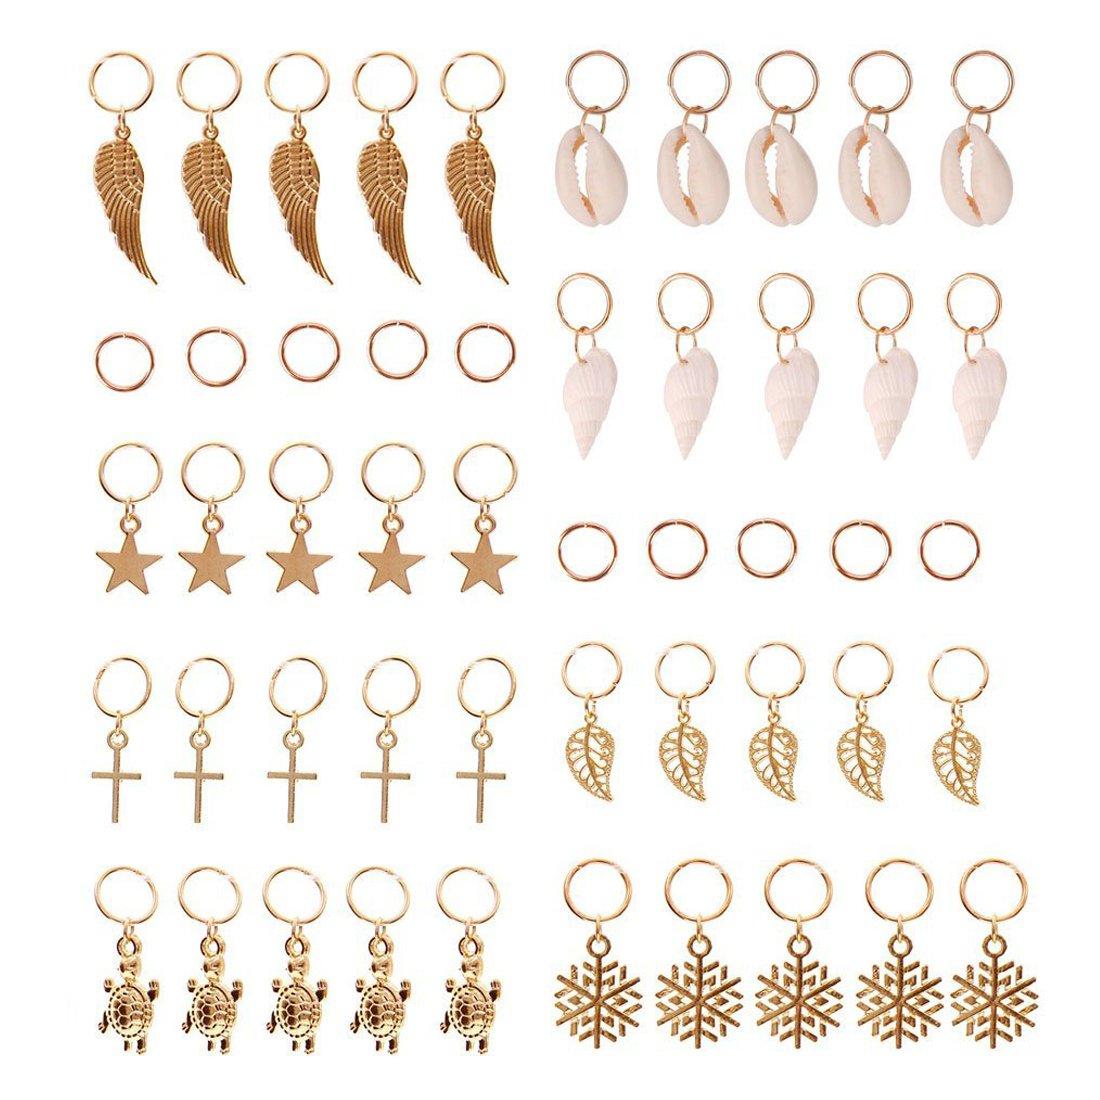 JIALEEY Hair Braid Rings, 50PCS Hair Loops Clips Gold Ring Shell Leaves Star Conch Snowflake Pendant Charms Set Hair Clip Headband Accessories